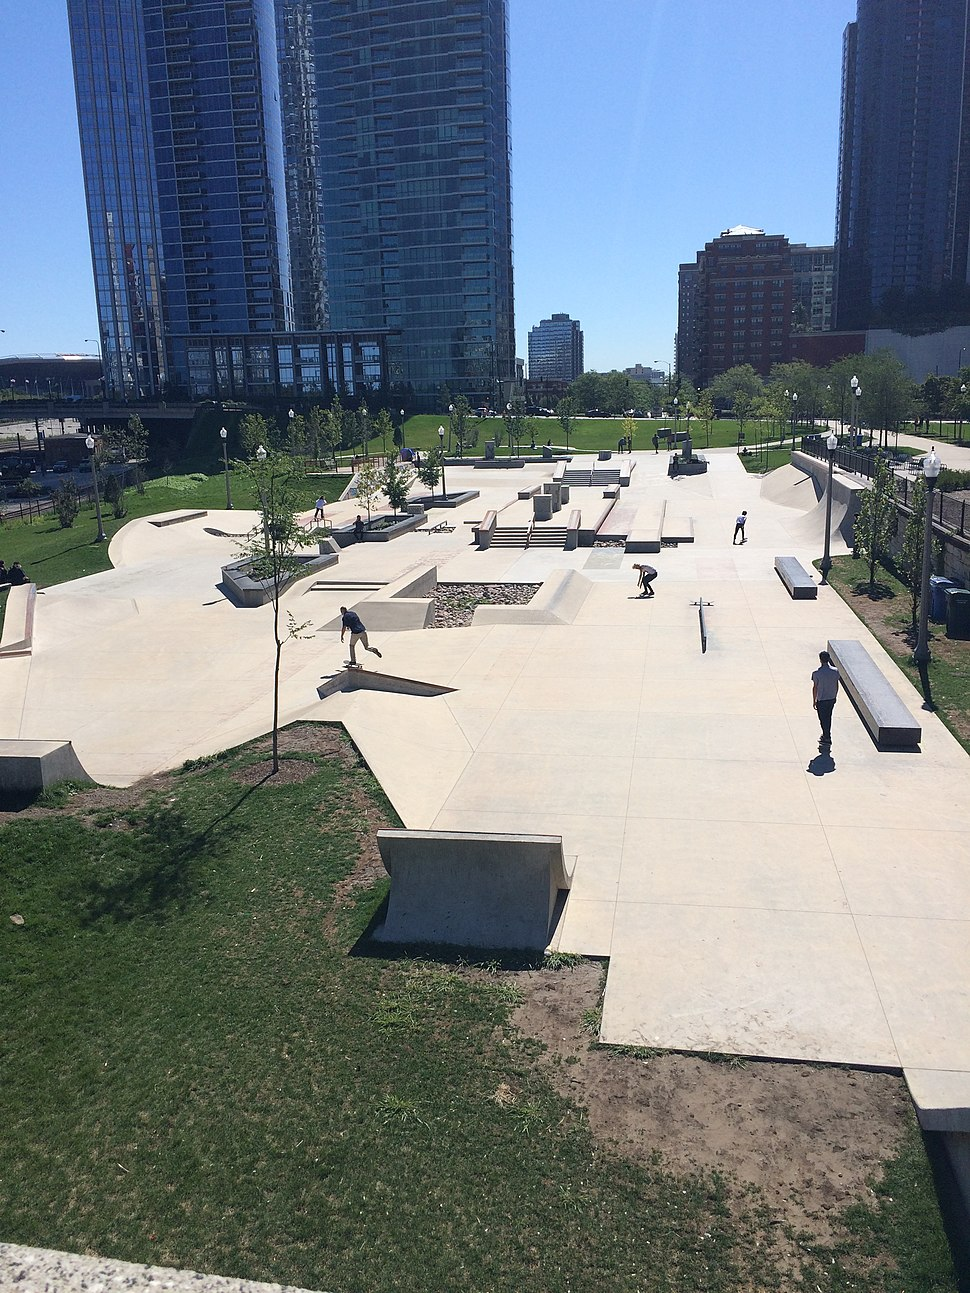 Grant Park Skate Park North View